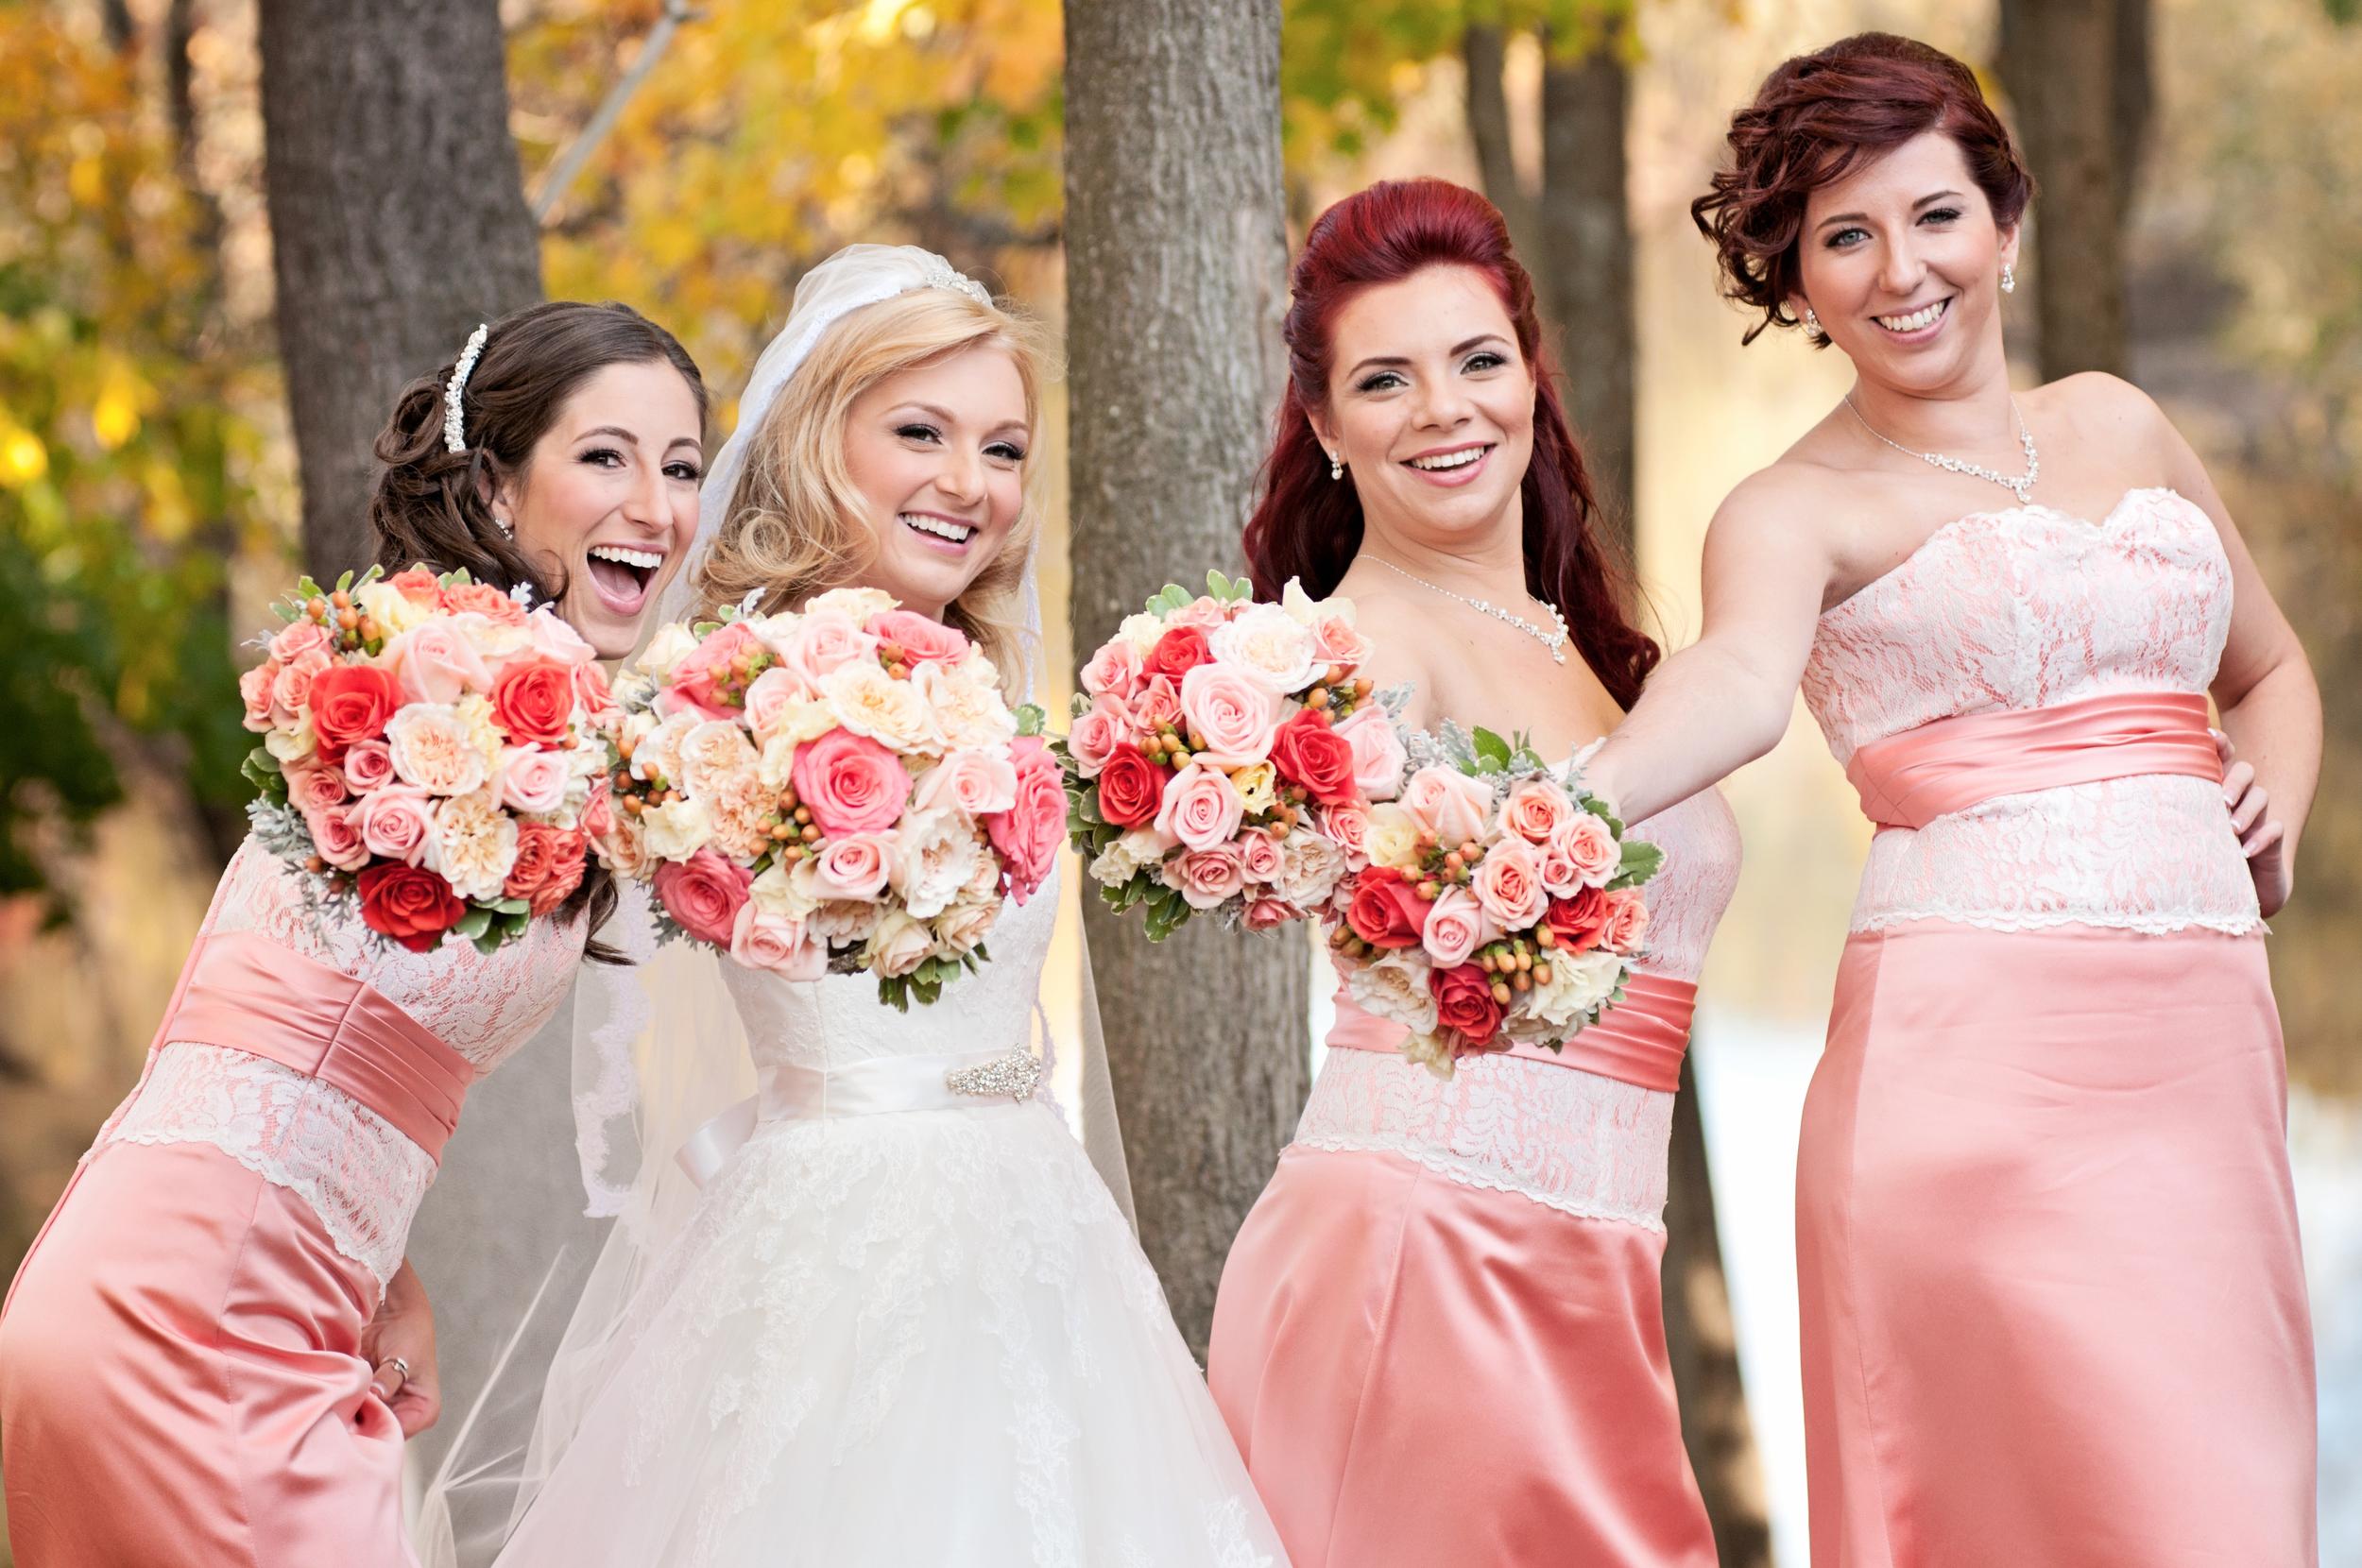 Angela_Chicoski_CT_wedding_photographer_079.jpg